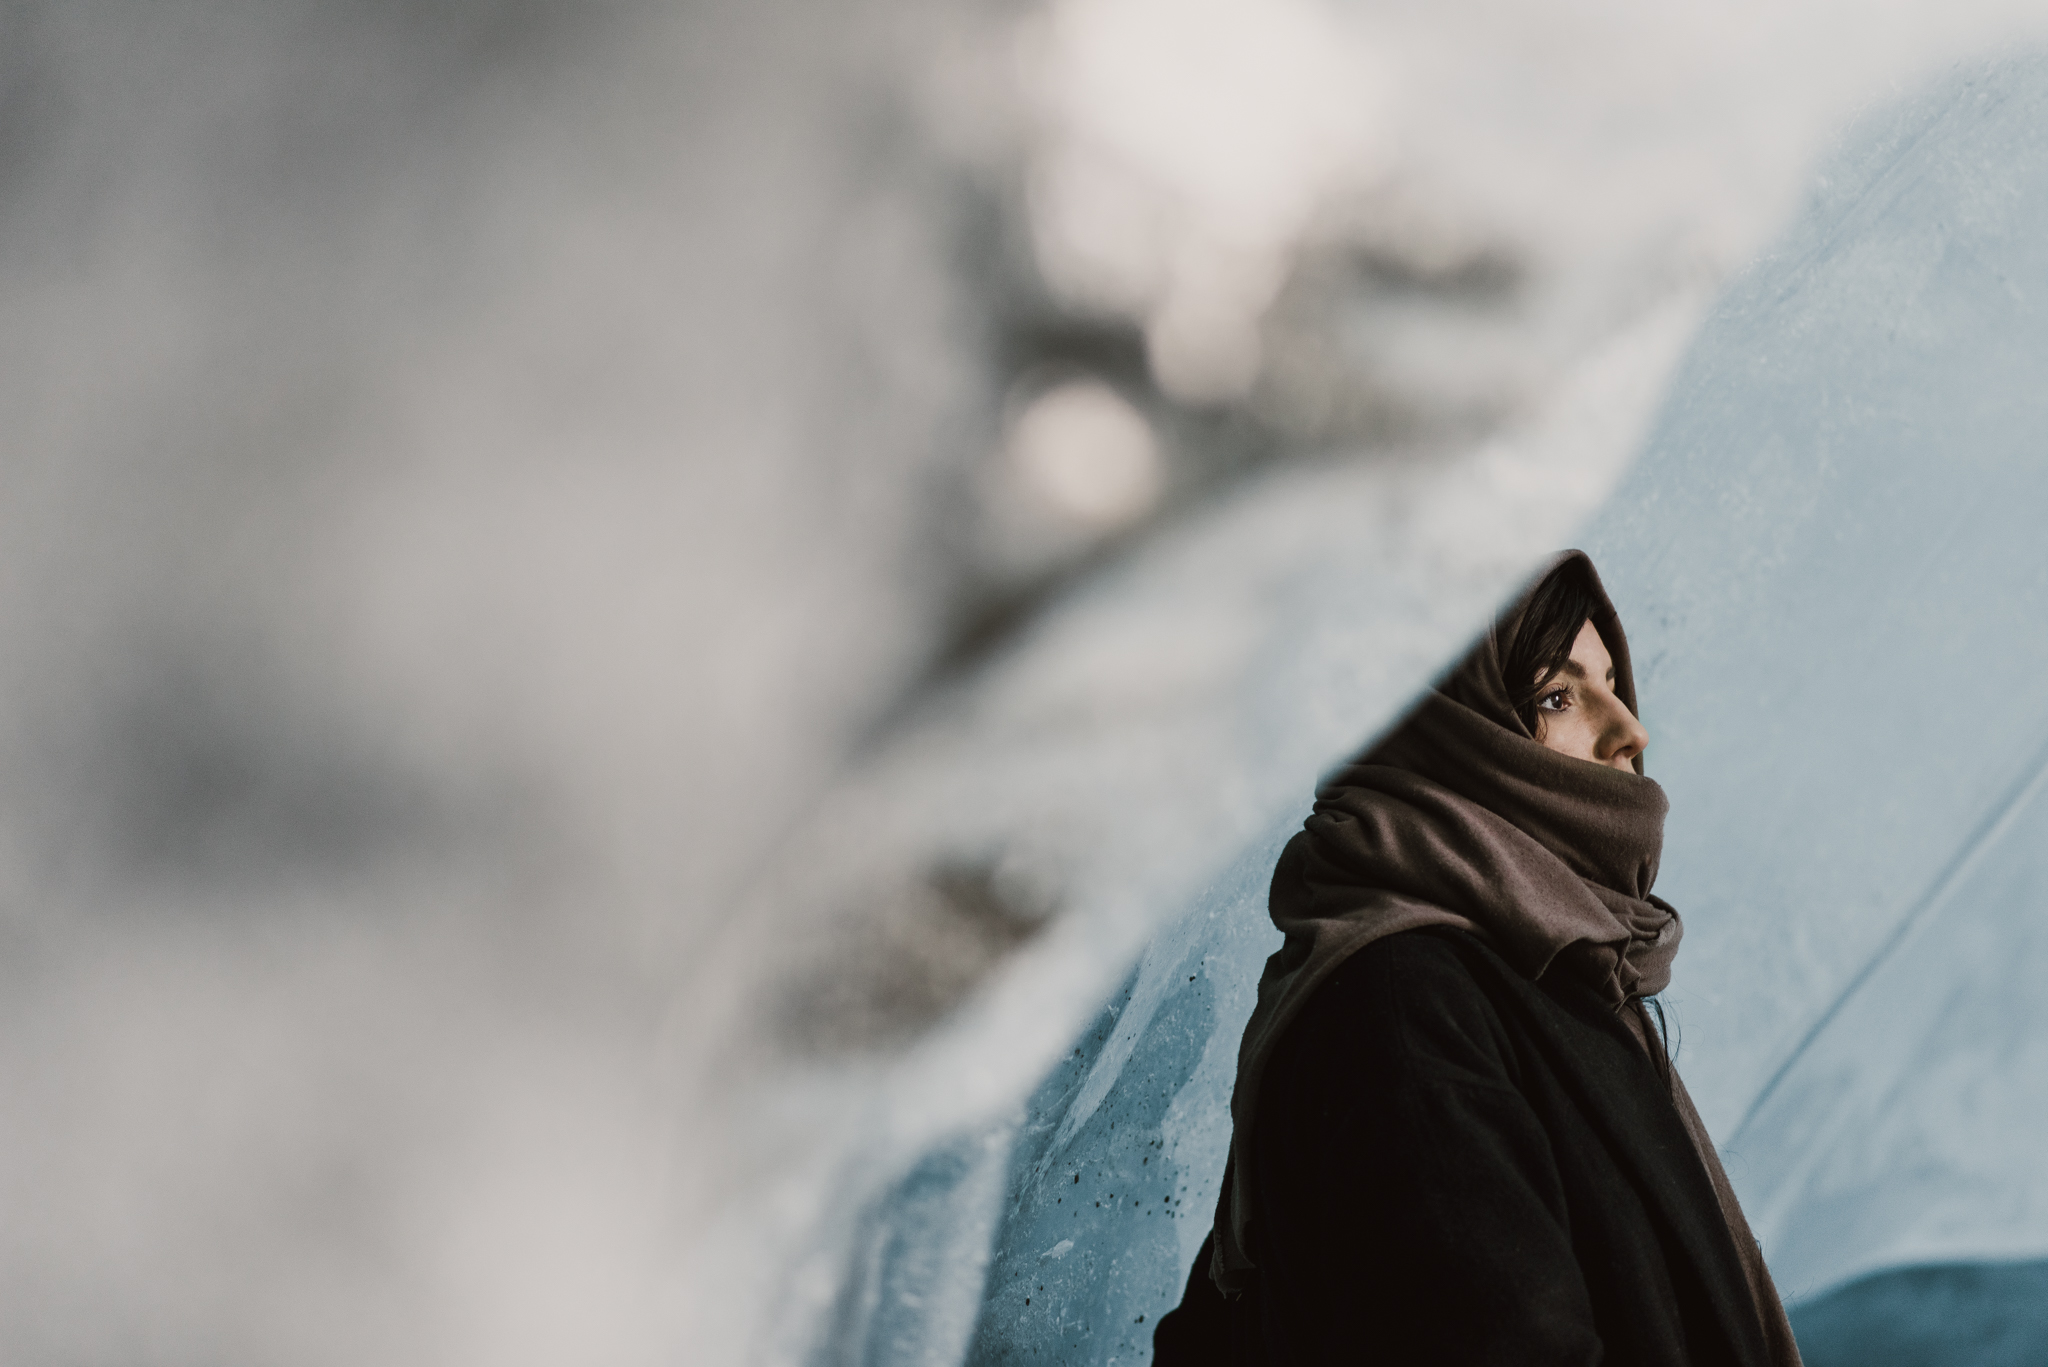 ©The-Ryans-Photo---Athabasca-Glacier,-Ice-Cave-041.jpg